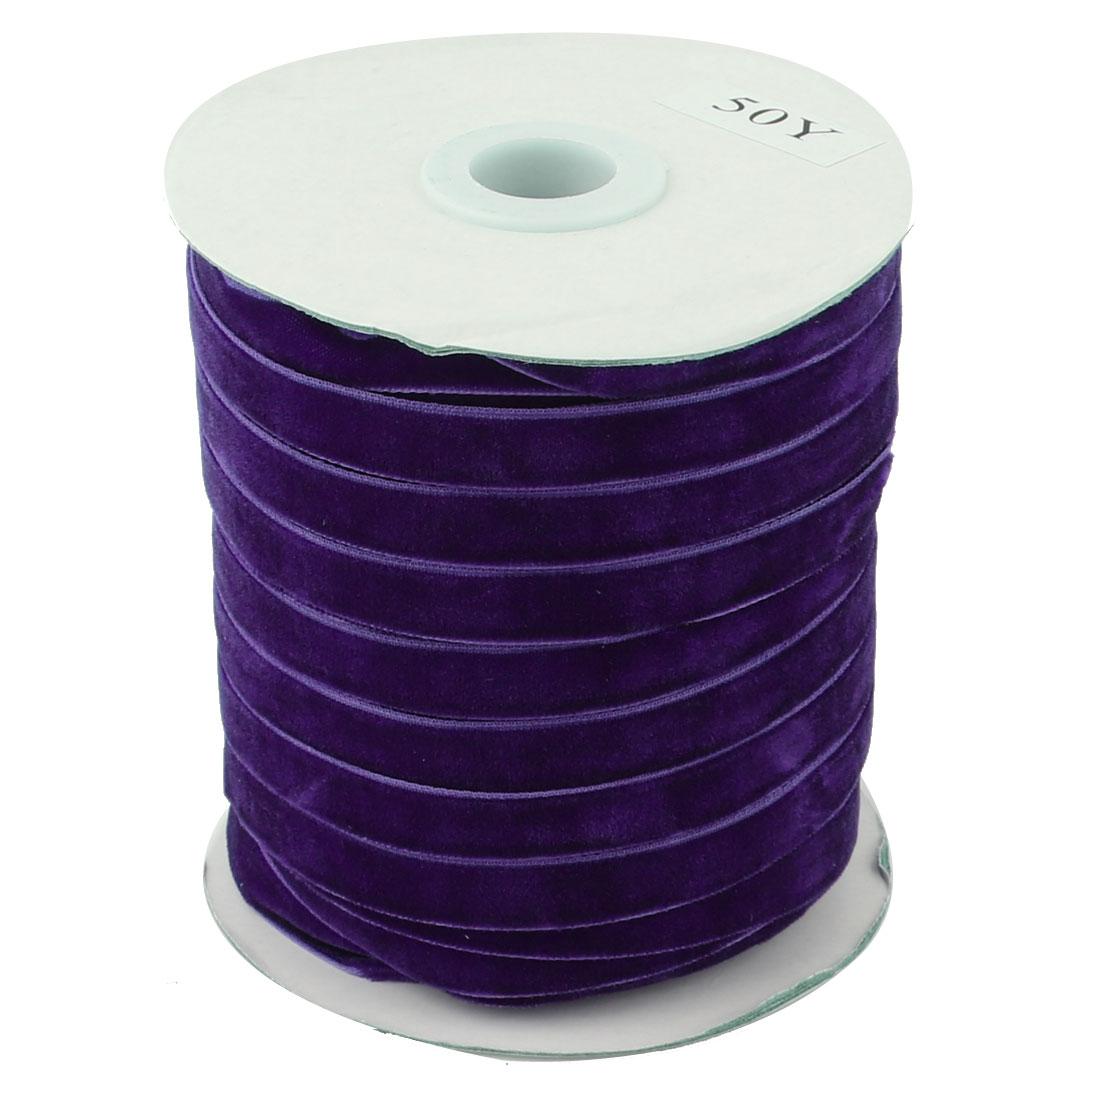 Festival Party Decoration Velvet Ribbon Round Roll Dark Purple 50 Yard 1cm Width